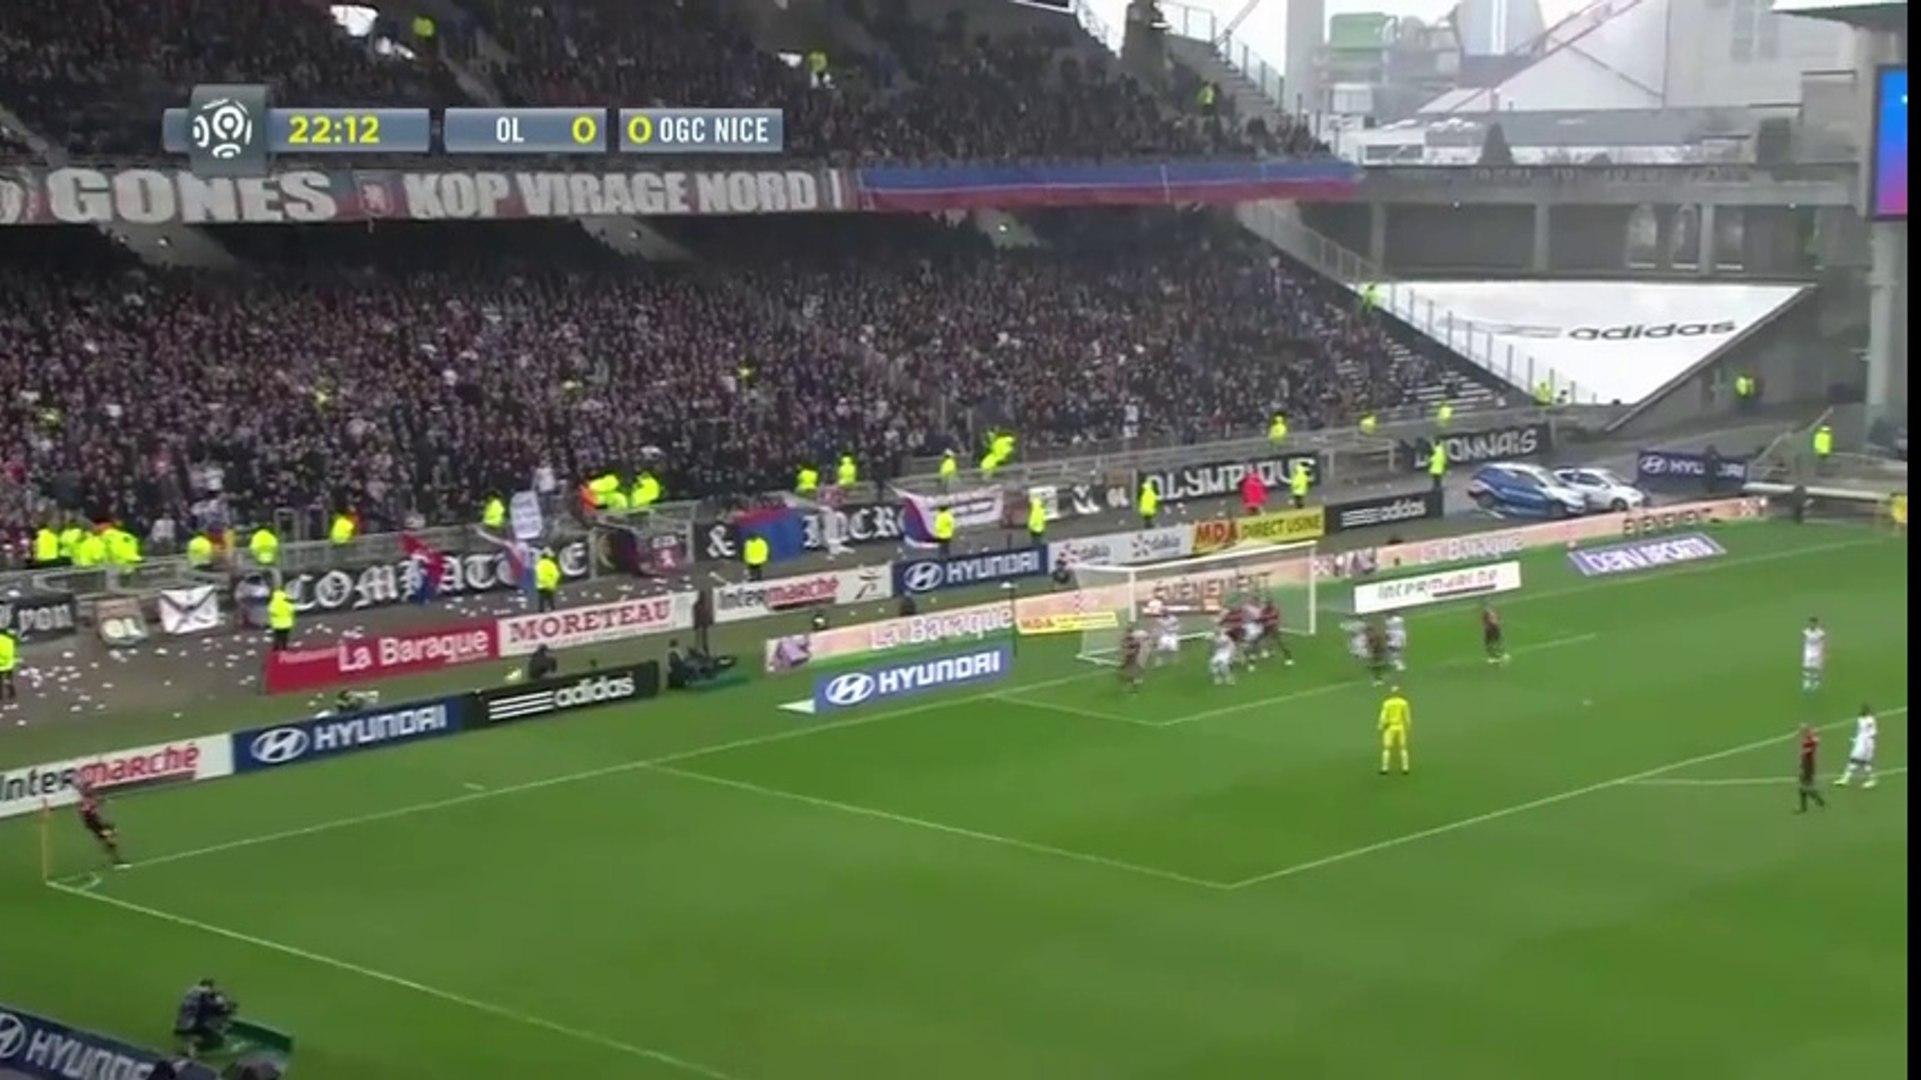 Lyon 1 - 2 Nice [Ligue 1] Highlights - Soccer Highlights Today - Latest Football Highlights Goals Vi